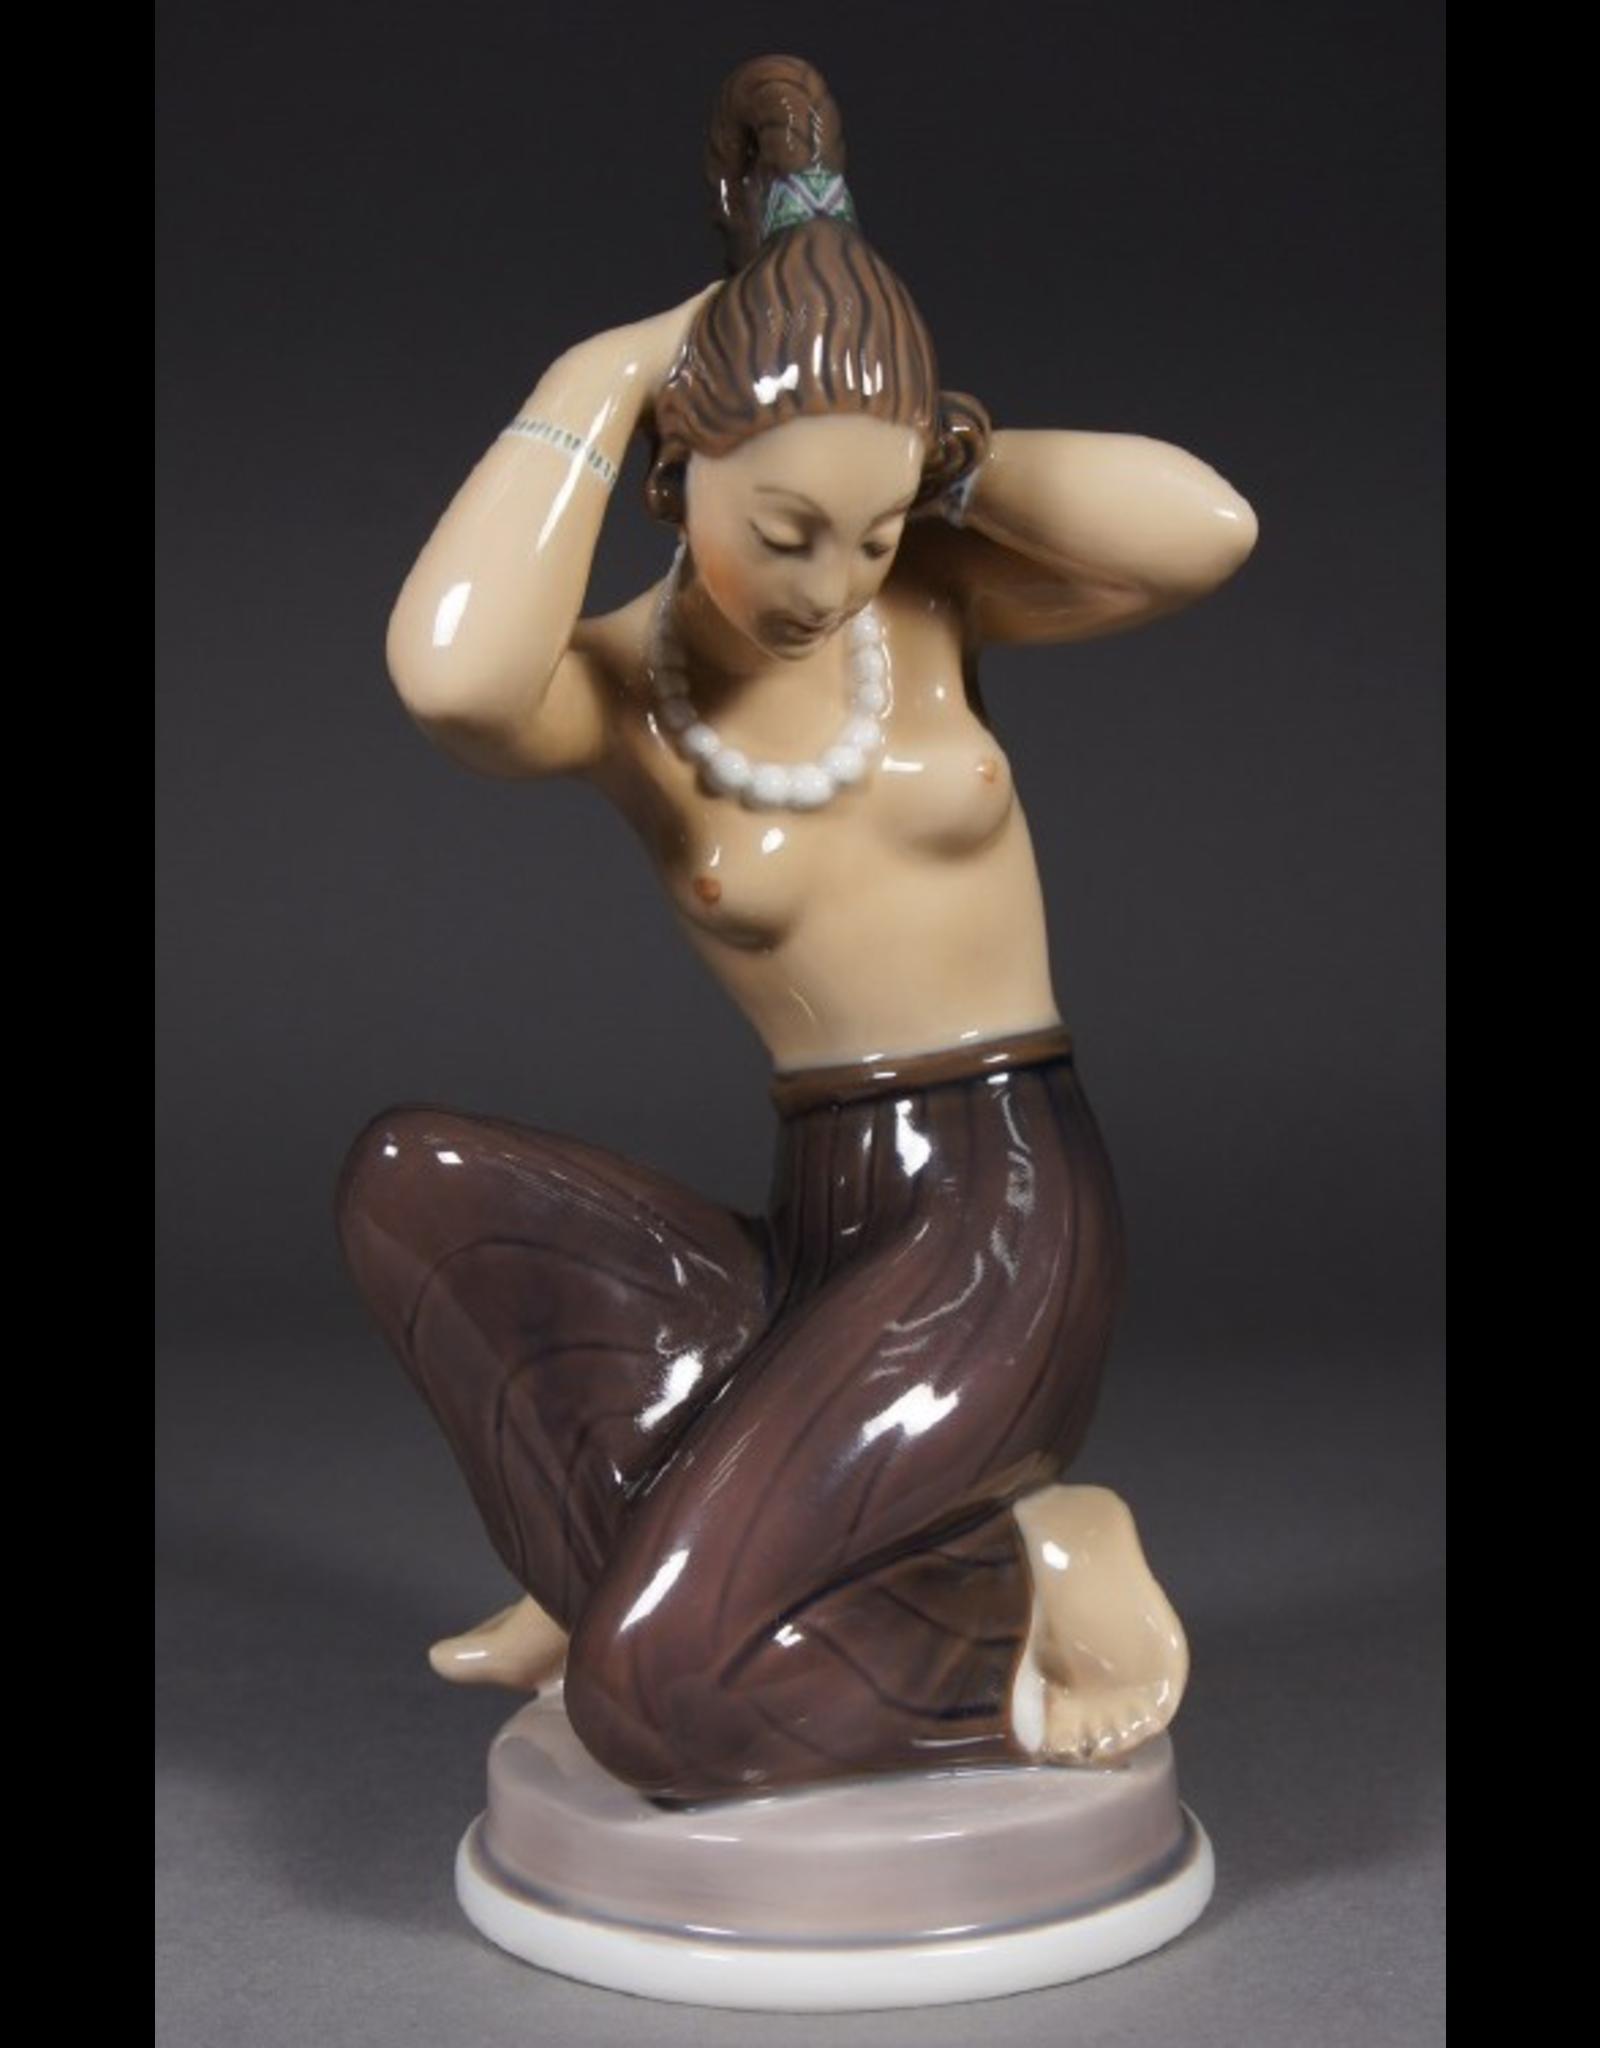 MANKS ANTIQUES ROYAL COPENHAGEN 皇家哥本哈根名瓷: 阿拉伯女孩雕像